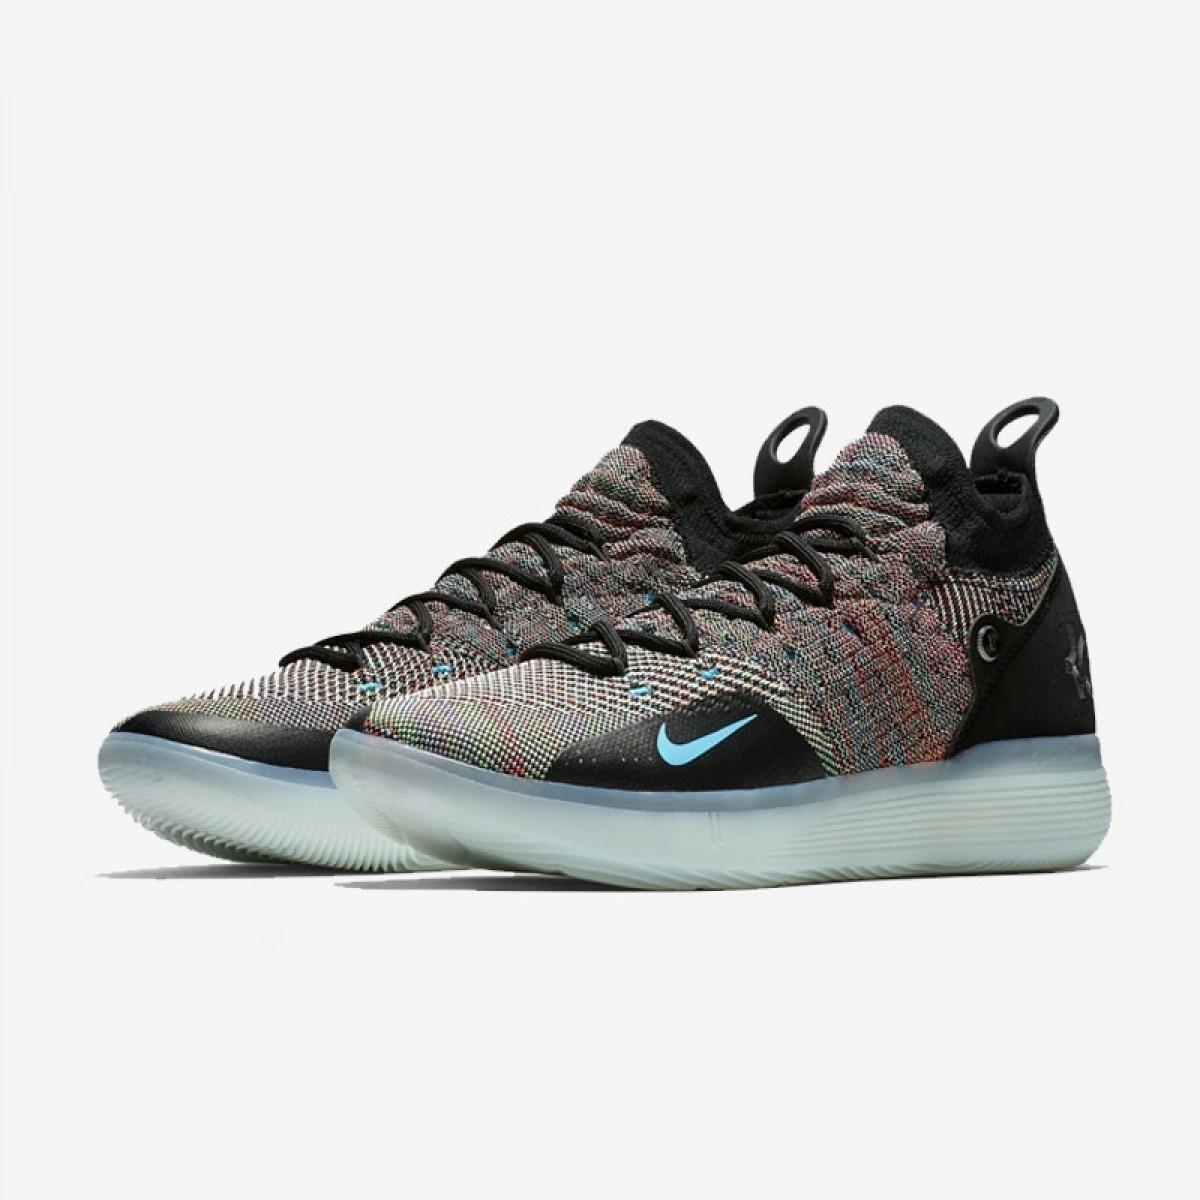 Nike KD 11 'Multicolor' AO2604-001